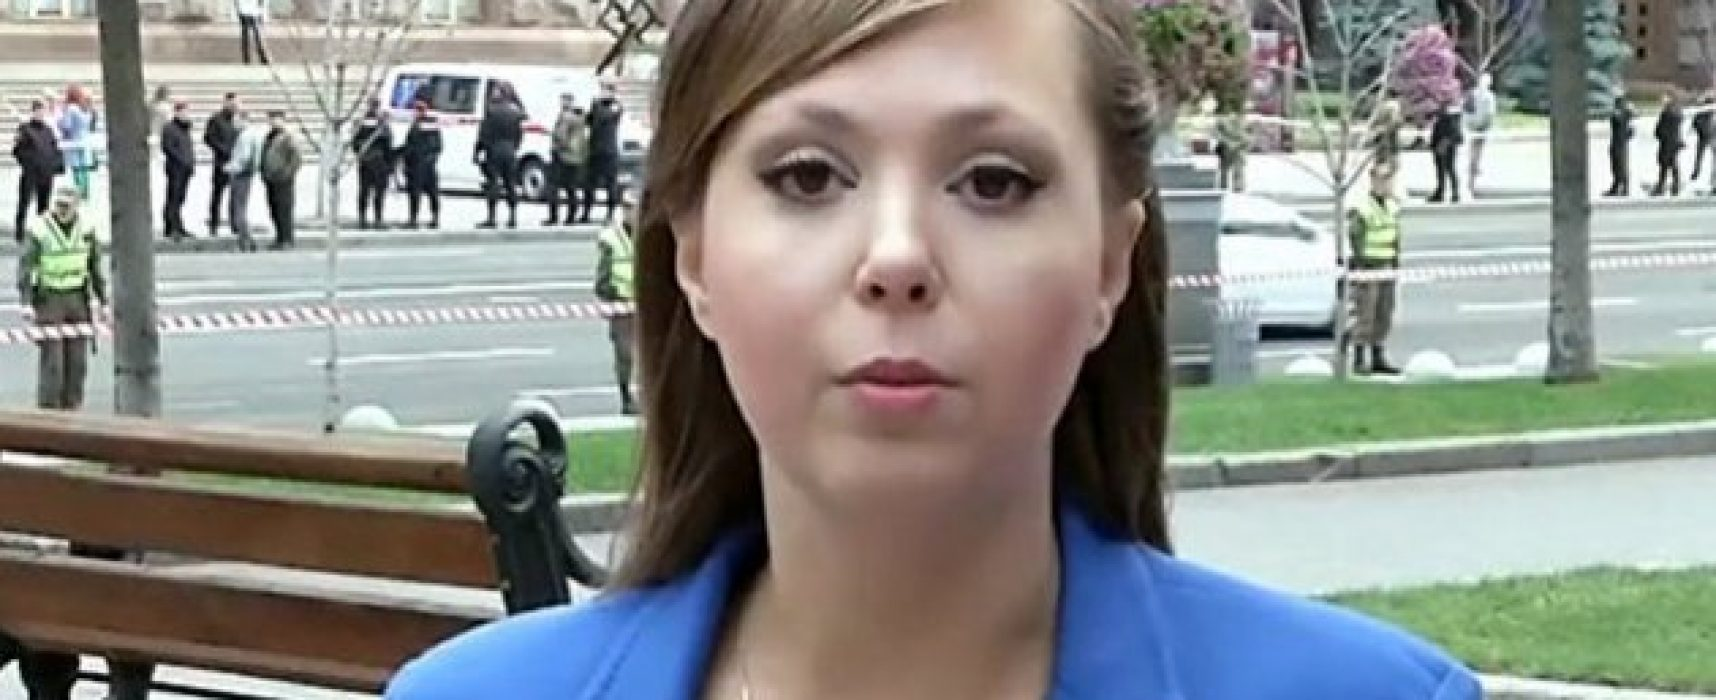 SBU: Periodista rusa Kurbatova será deportada de Ucrania